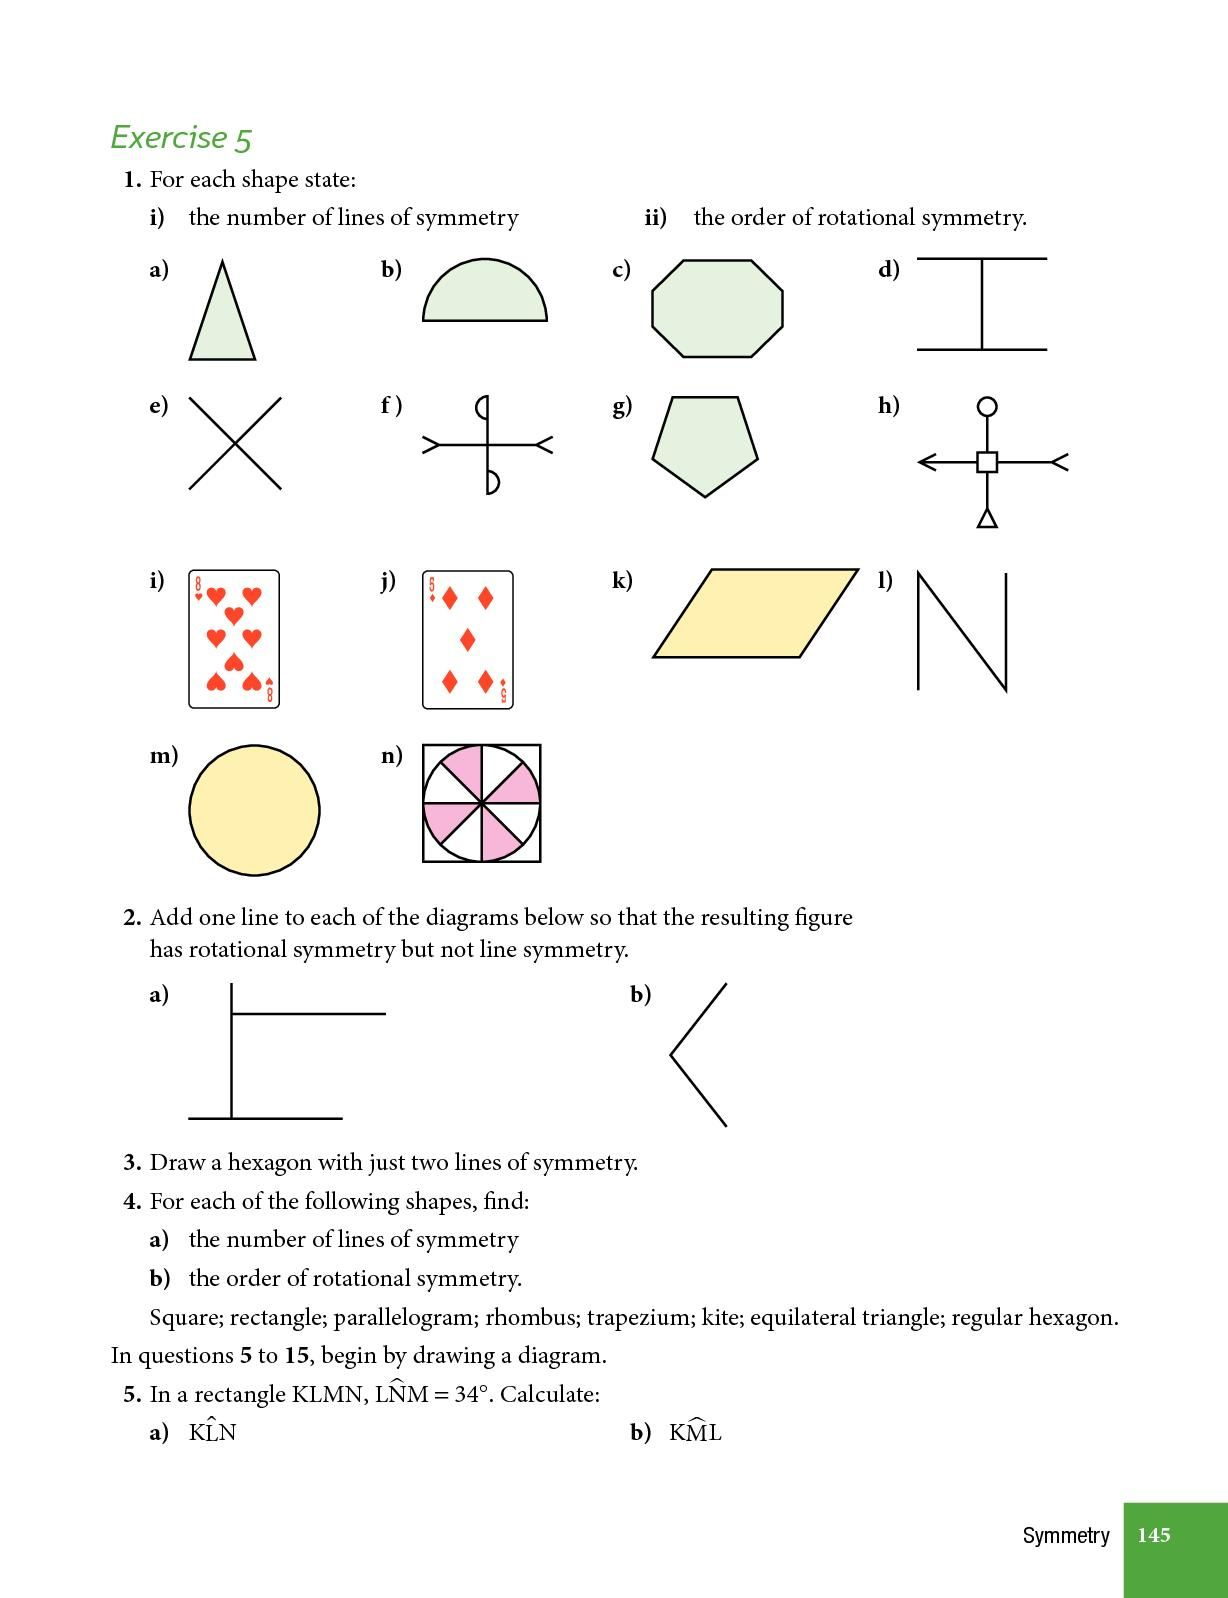 Pdf Print Complete Mathematics For Cambridge Igcse Fifth Edition Extended Cambridge Igcse Mathematics Igcse Maths